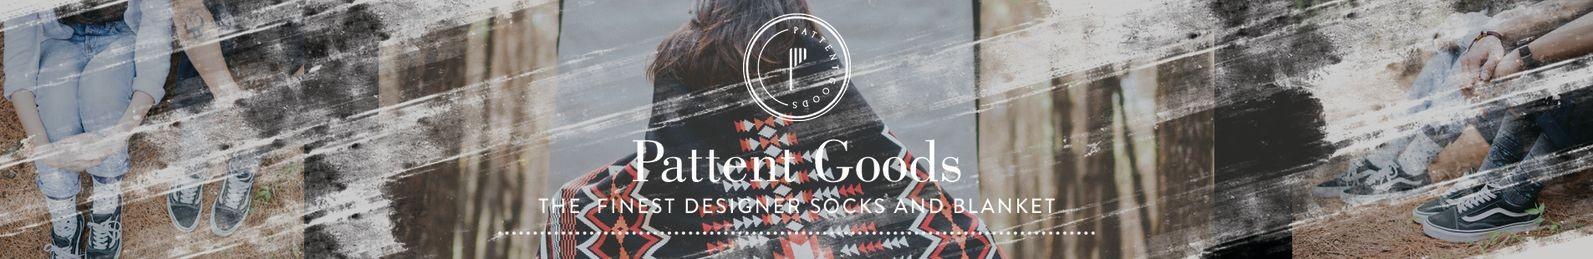 Pattent Goods